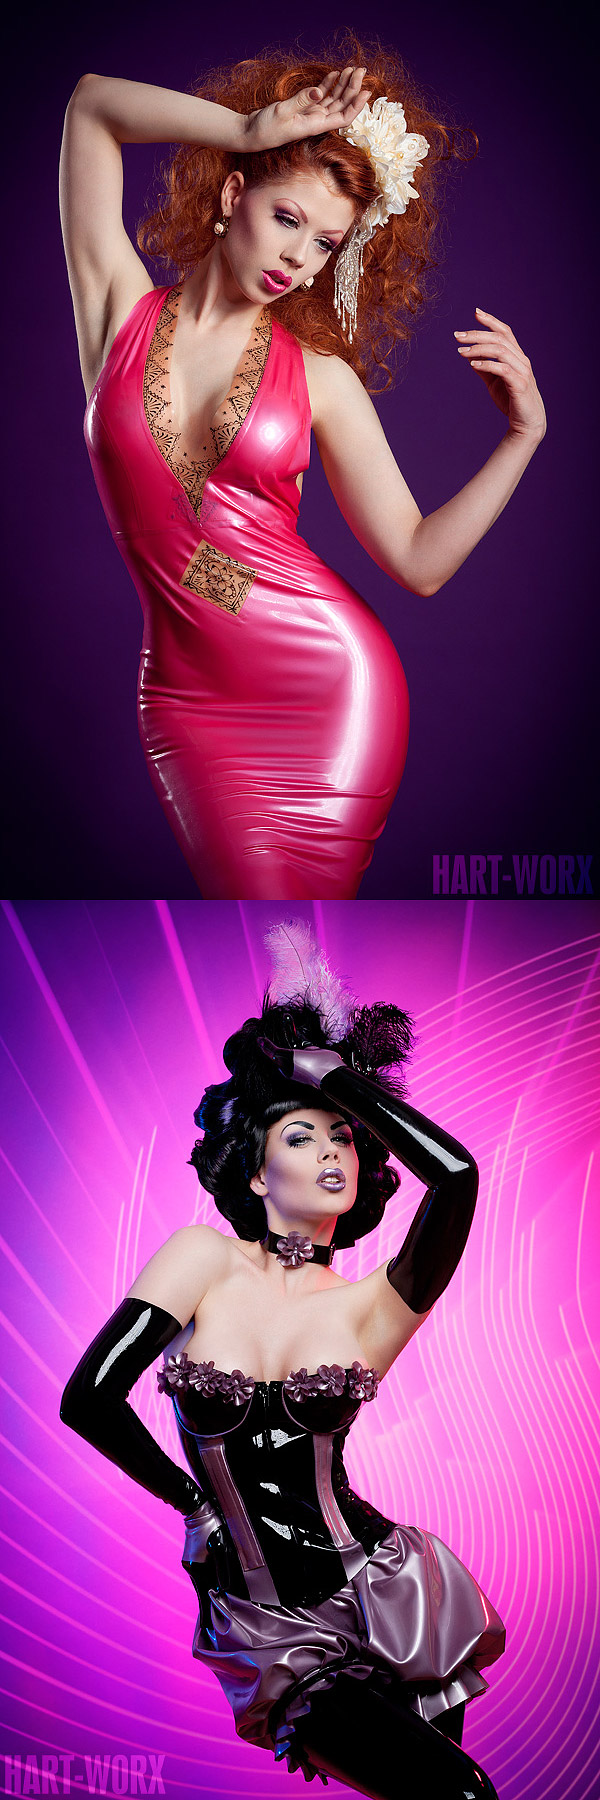 Jun 30, 2011 Hart- Worx model, make-up, styling, wig design: myself